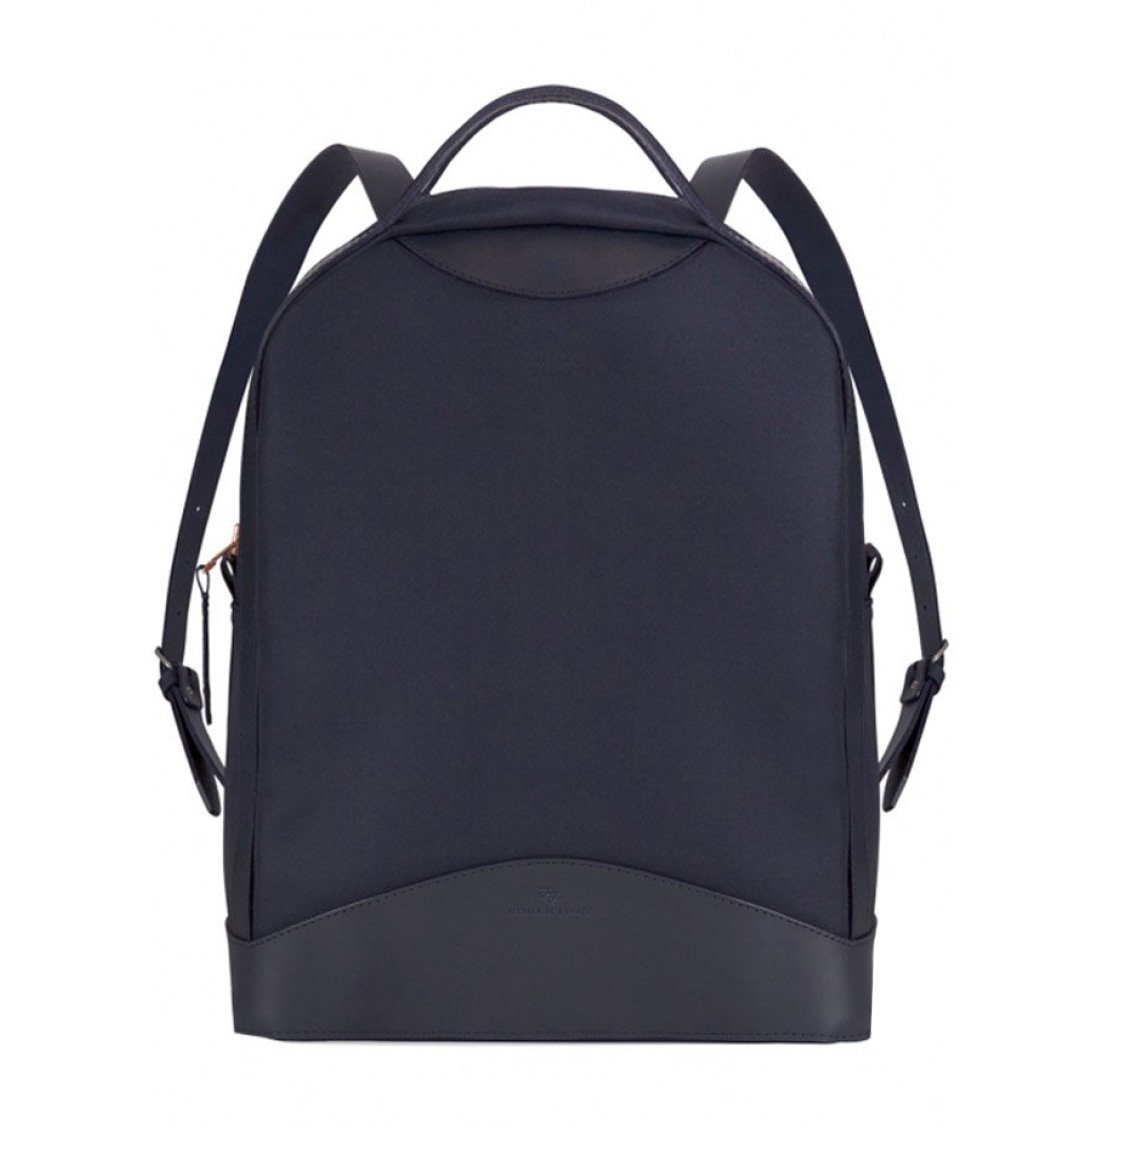 Atelier De L' Armee Navy Canvas Luxury Backpack